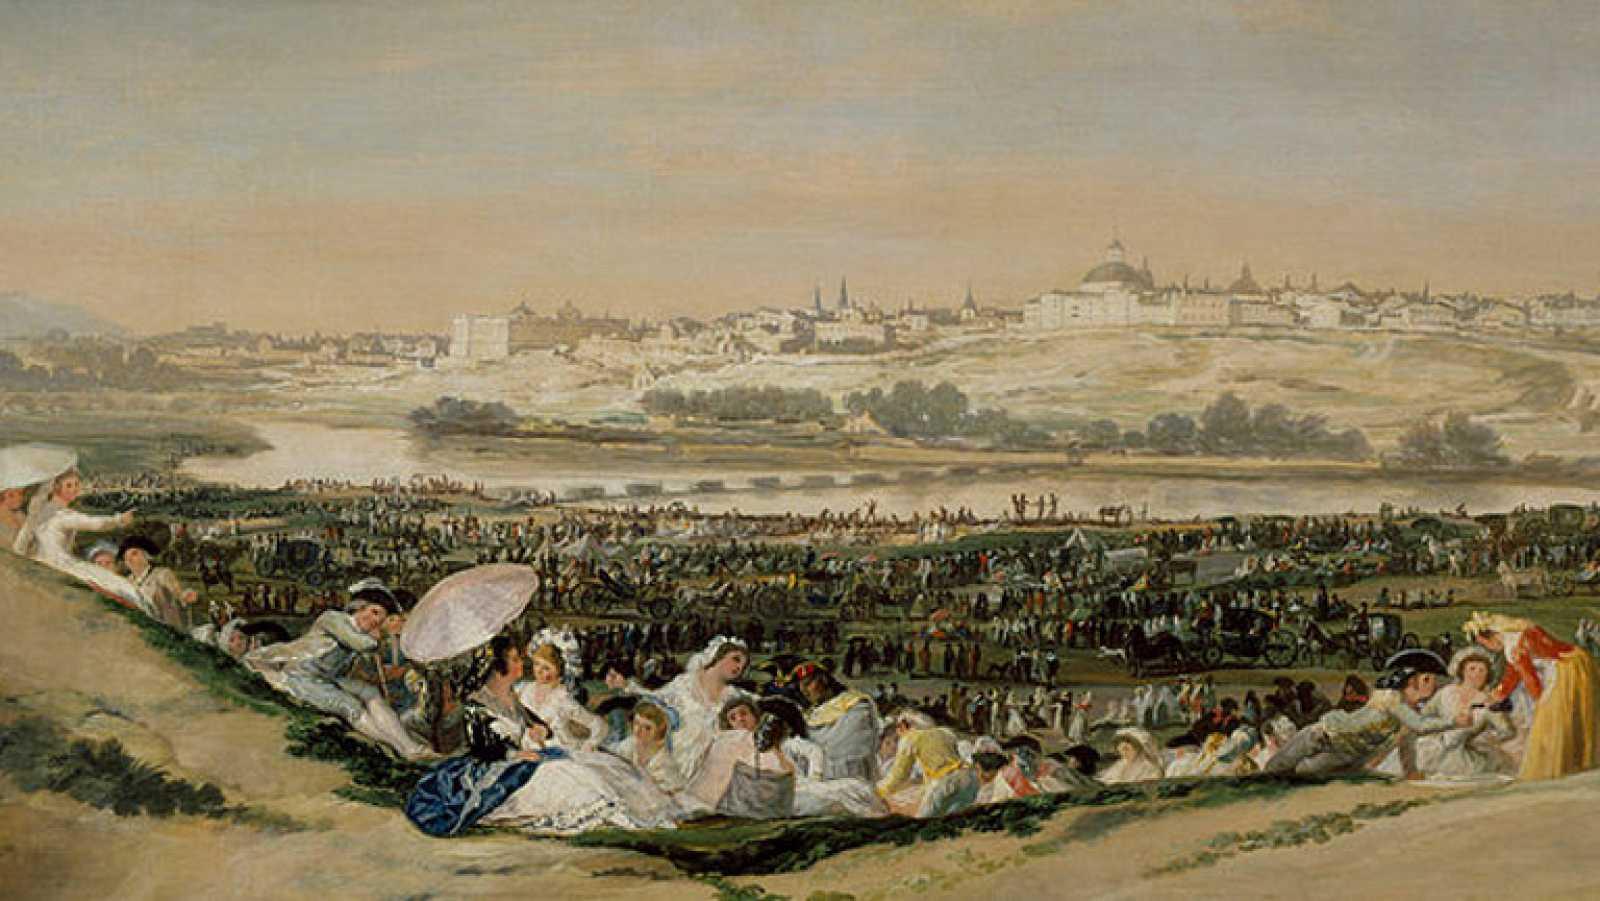 Mirar un cuadro - La pradera de San Isidro (Goya)